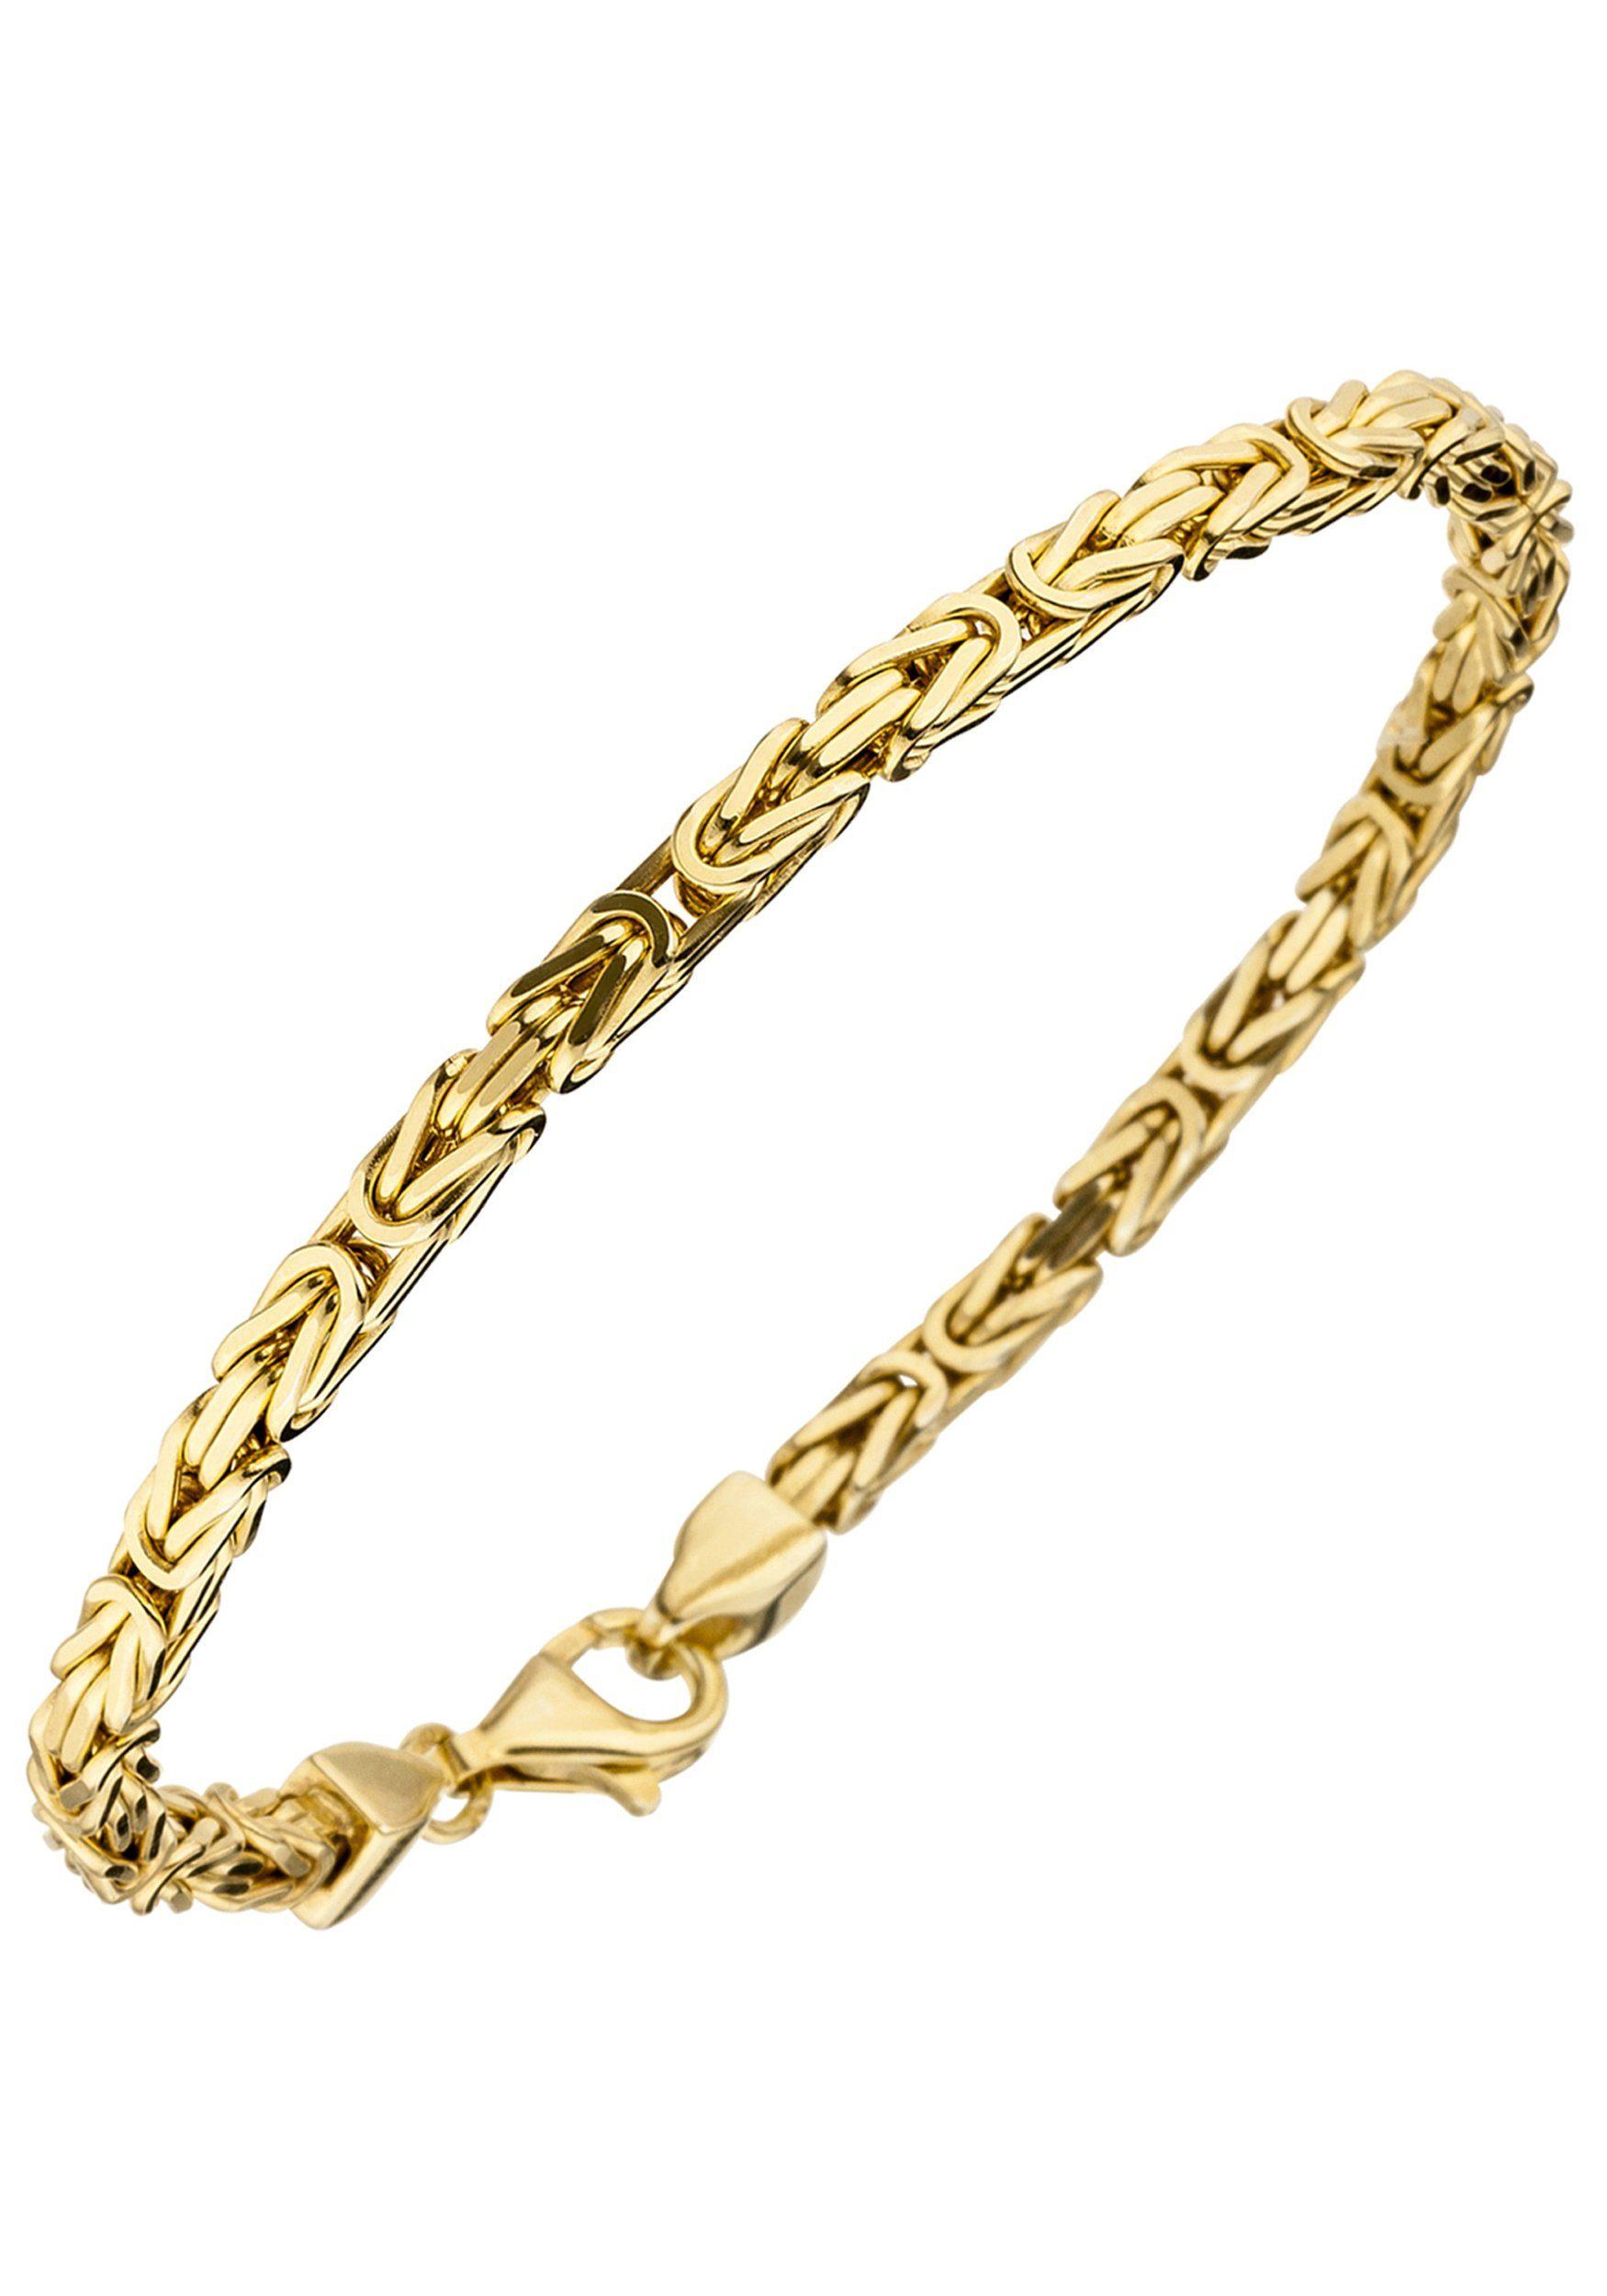 JOBO Armband Königsarmband 925 Silber vergoldet 19 cm